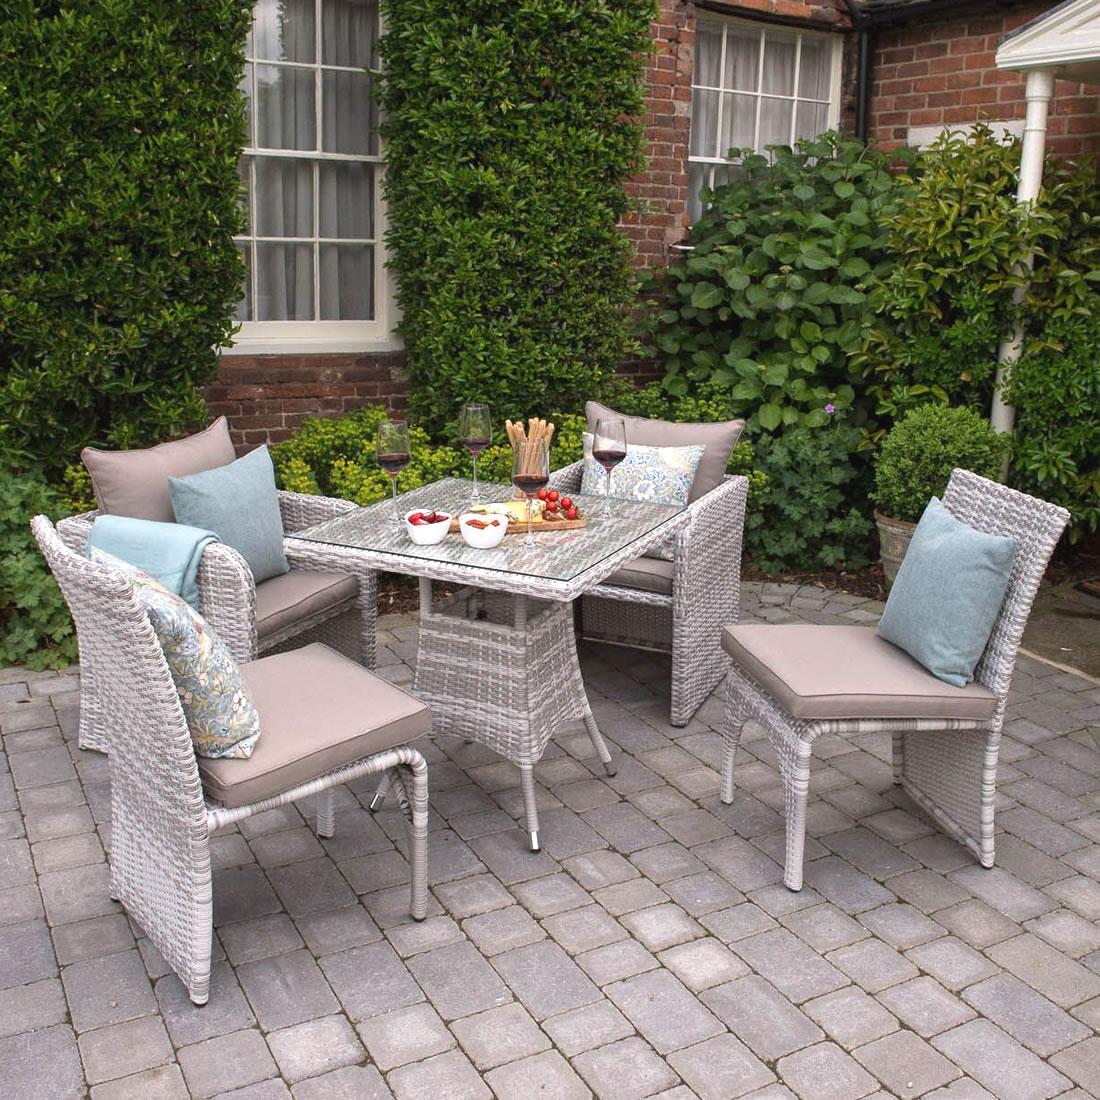 Morston Modular 2 To 4 Seater Garden Furniture Set 445